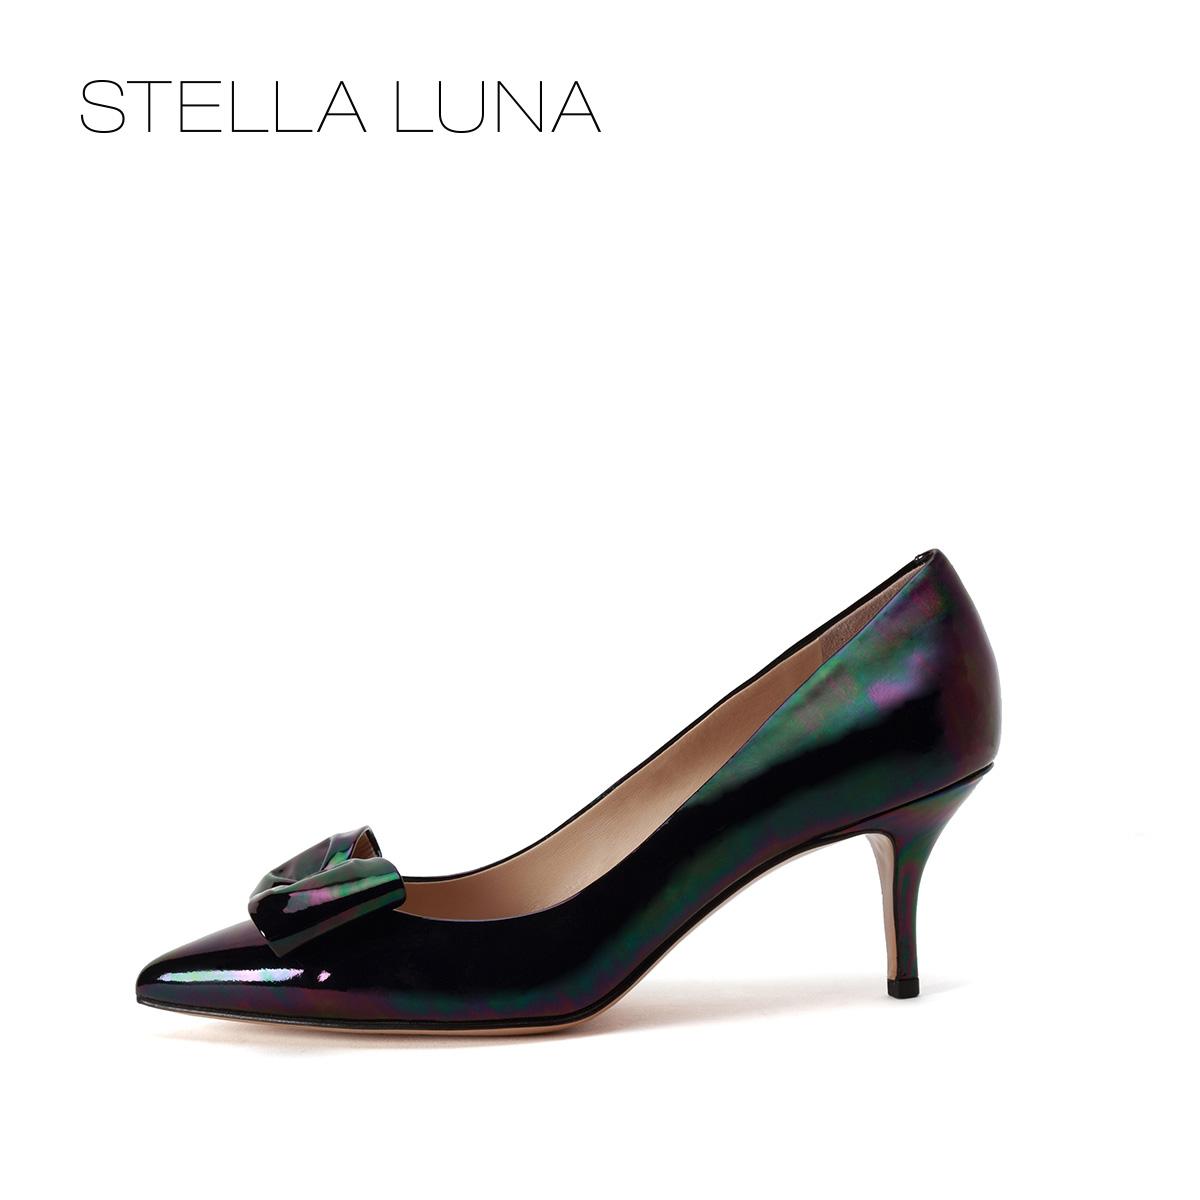 STELLA LUNA春夏浅口细跟女鞋牛皮尖头蝴蝶高跟单鞋SG133L02829